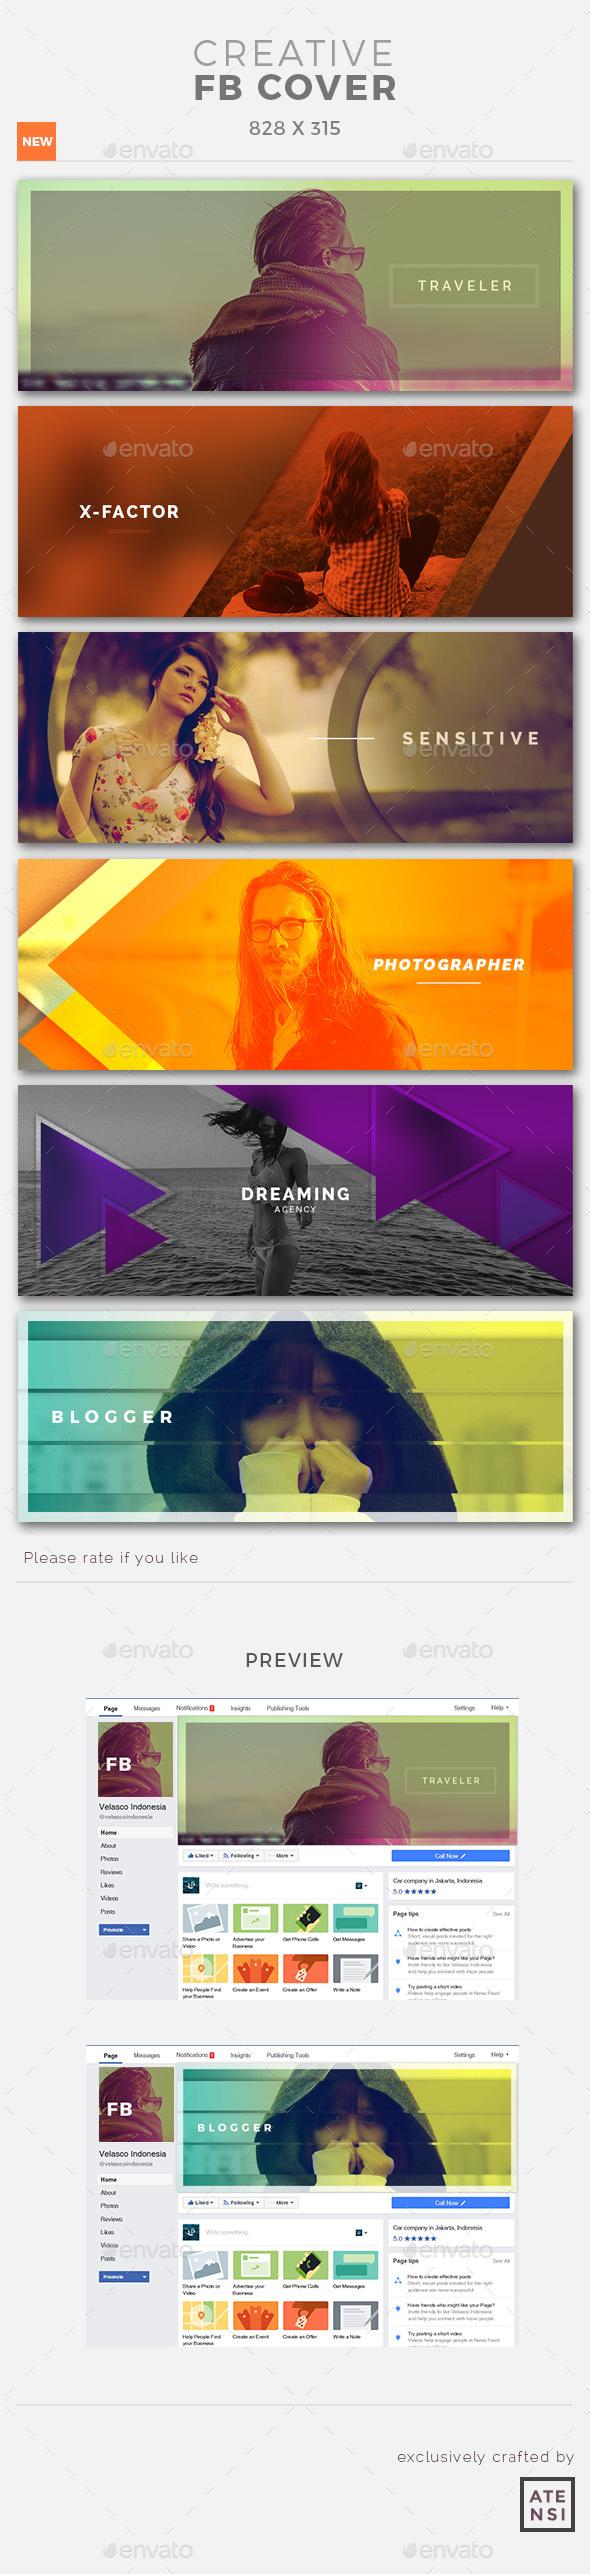 Creative Facebook Cover - Facebook Timeline Covers Social Media